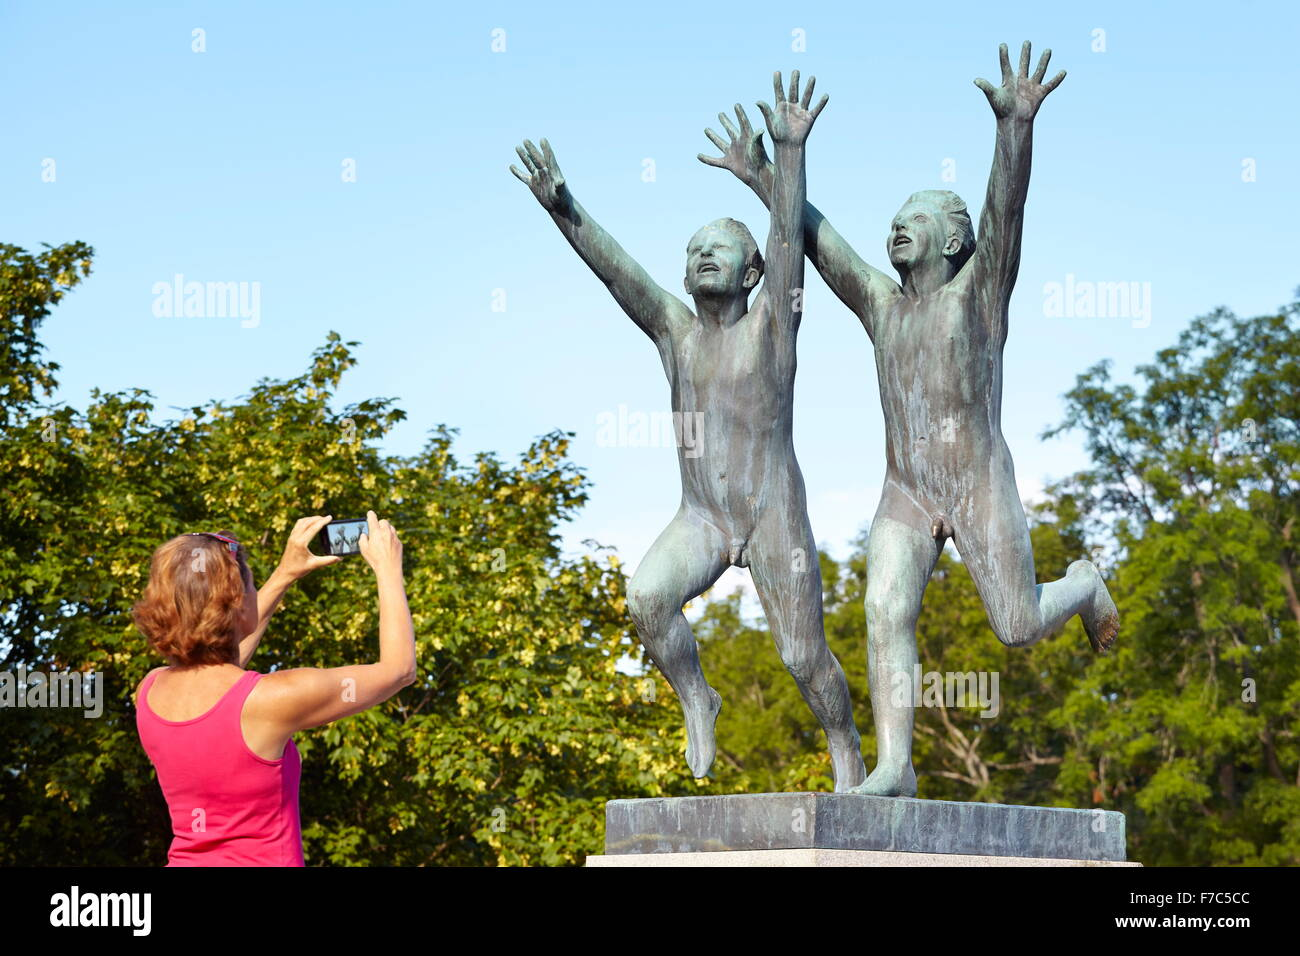 Gustav Vigeland Sculpture Park, Oslo, Norway - Stock Image